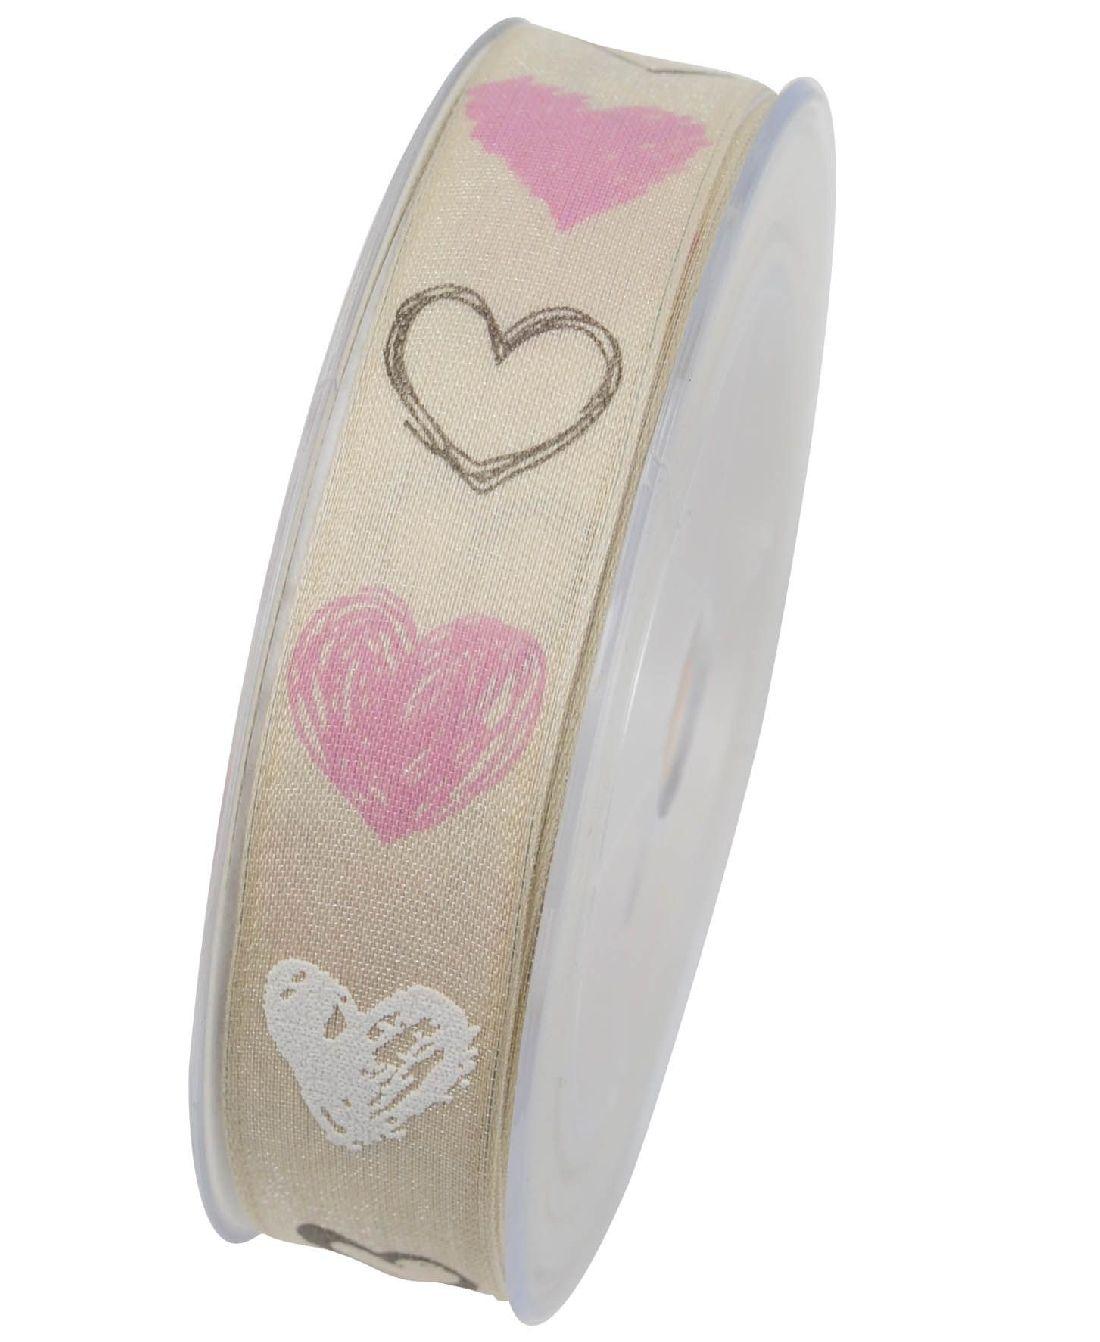 Herzband Heiratsantrag ROSA X752 21 B:25mm L:20Meter mit Draht